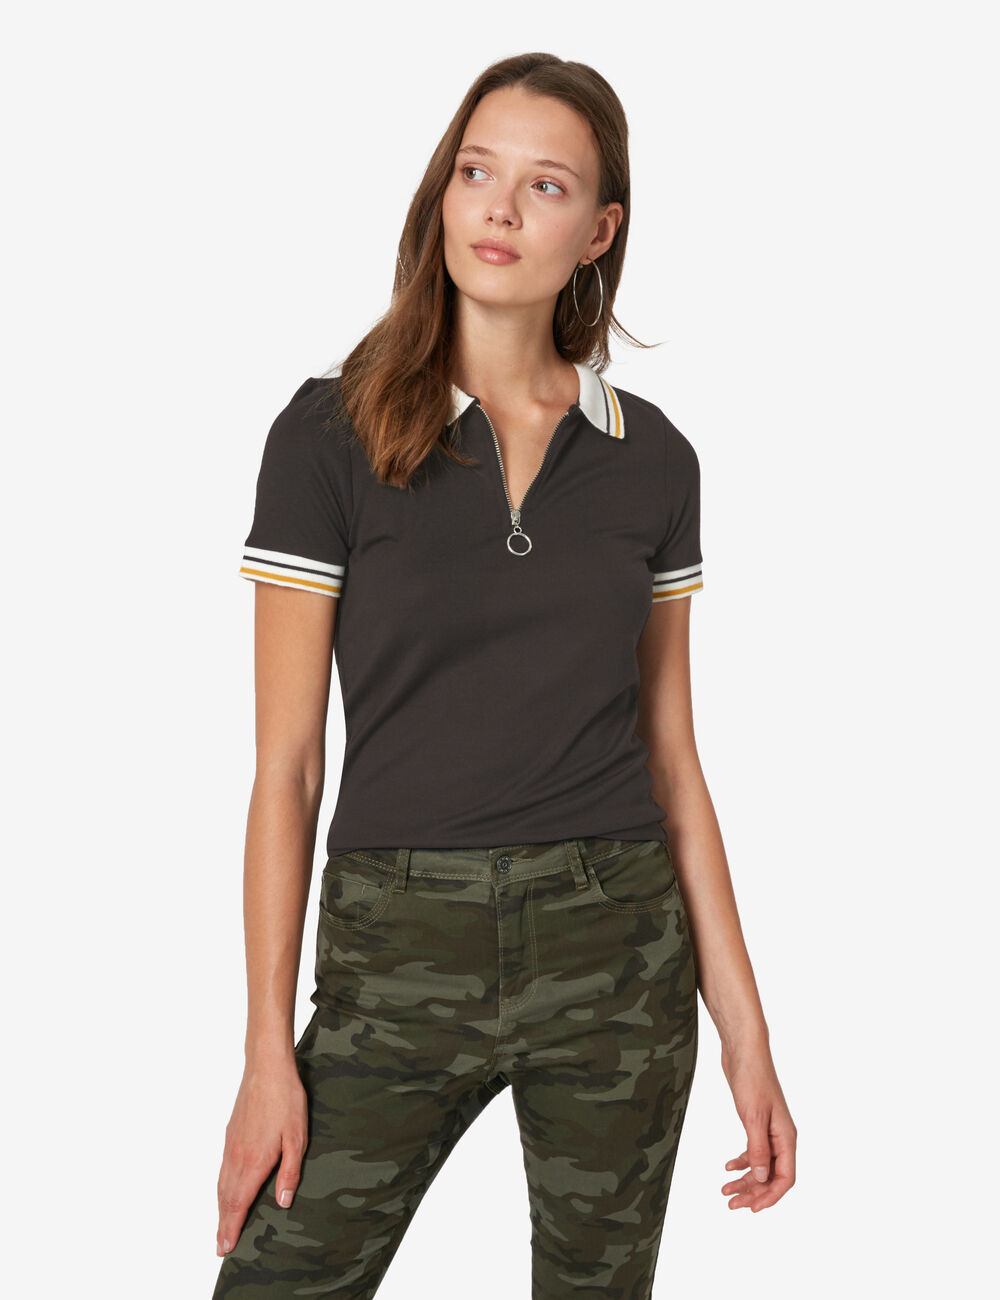 Polo Shirt With Black Dress Pants